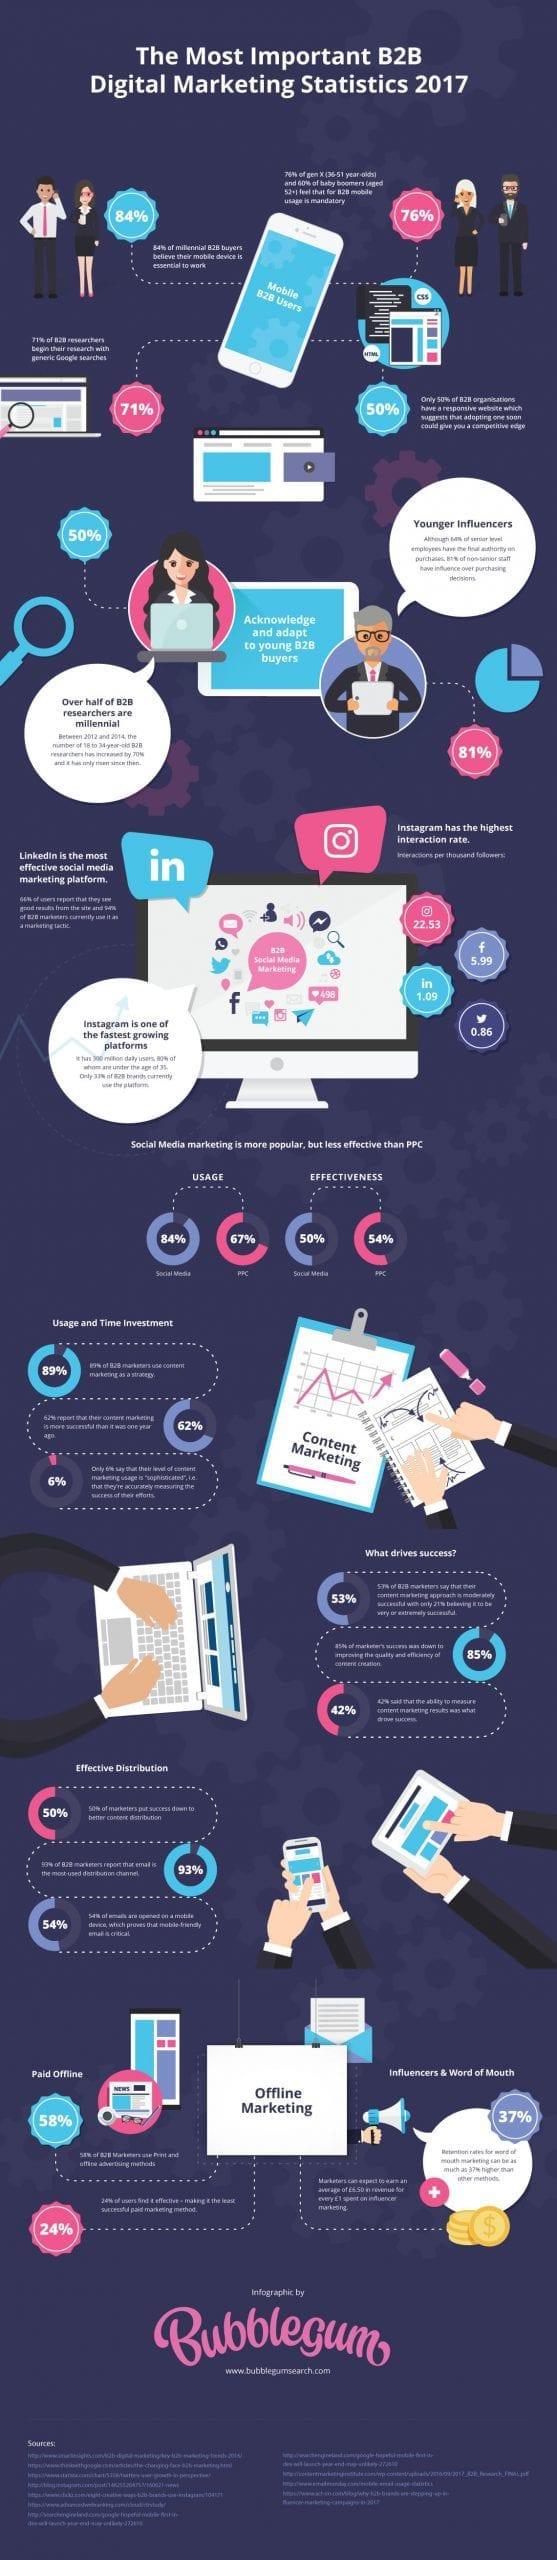 170901-infographic-digital-marketing-stats-2017-full-1-3073805